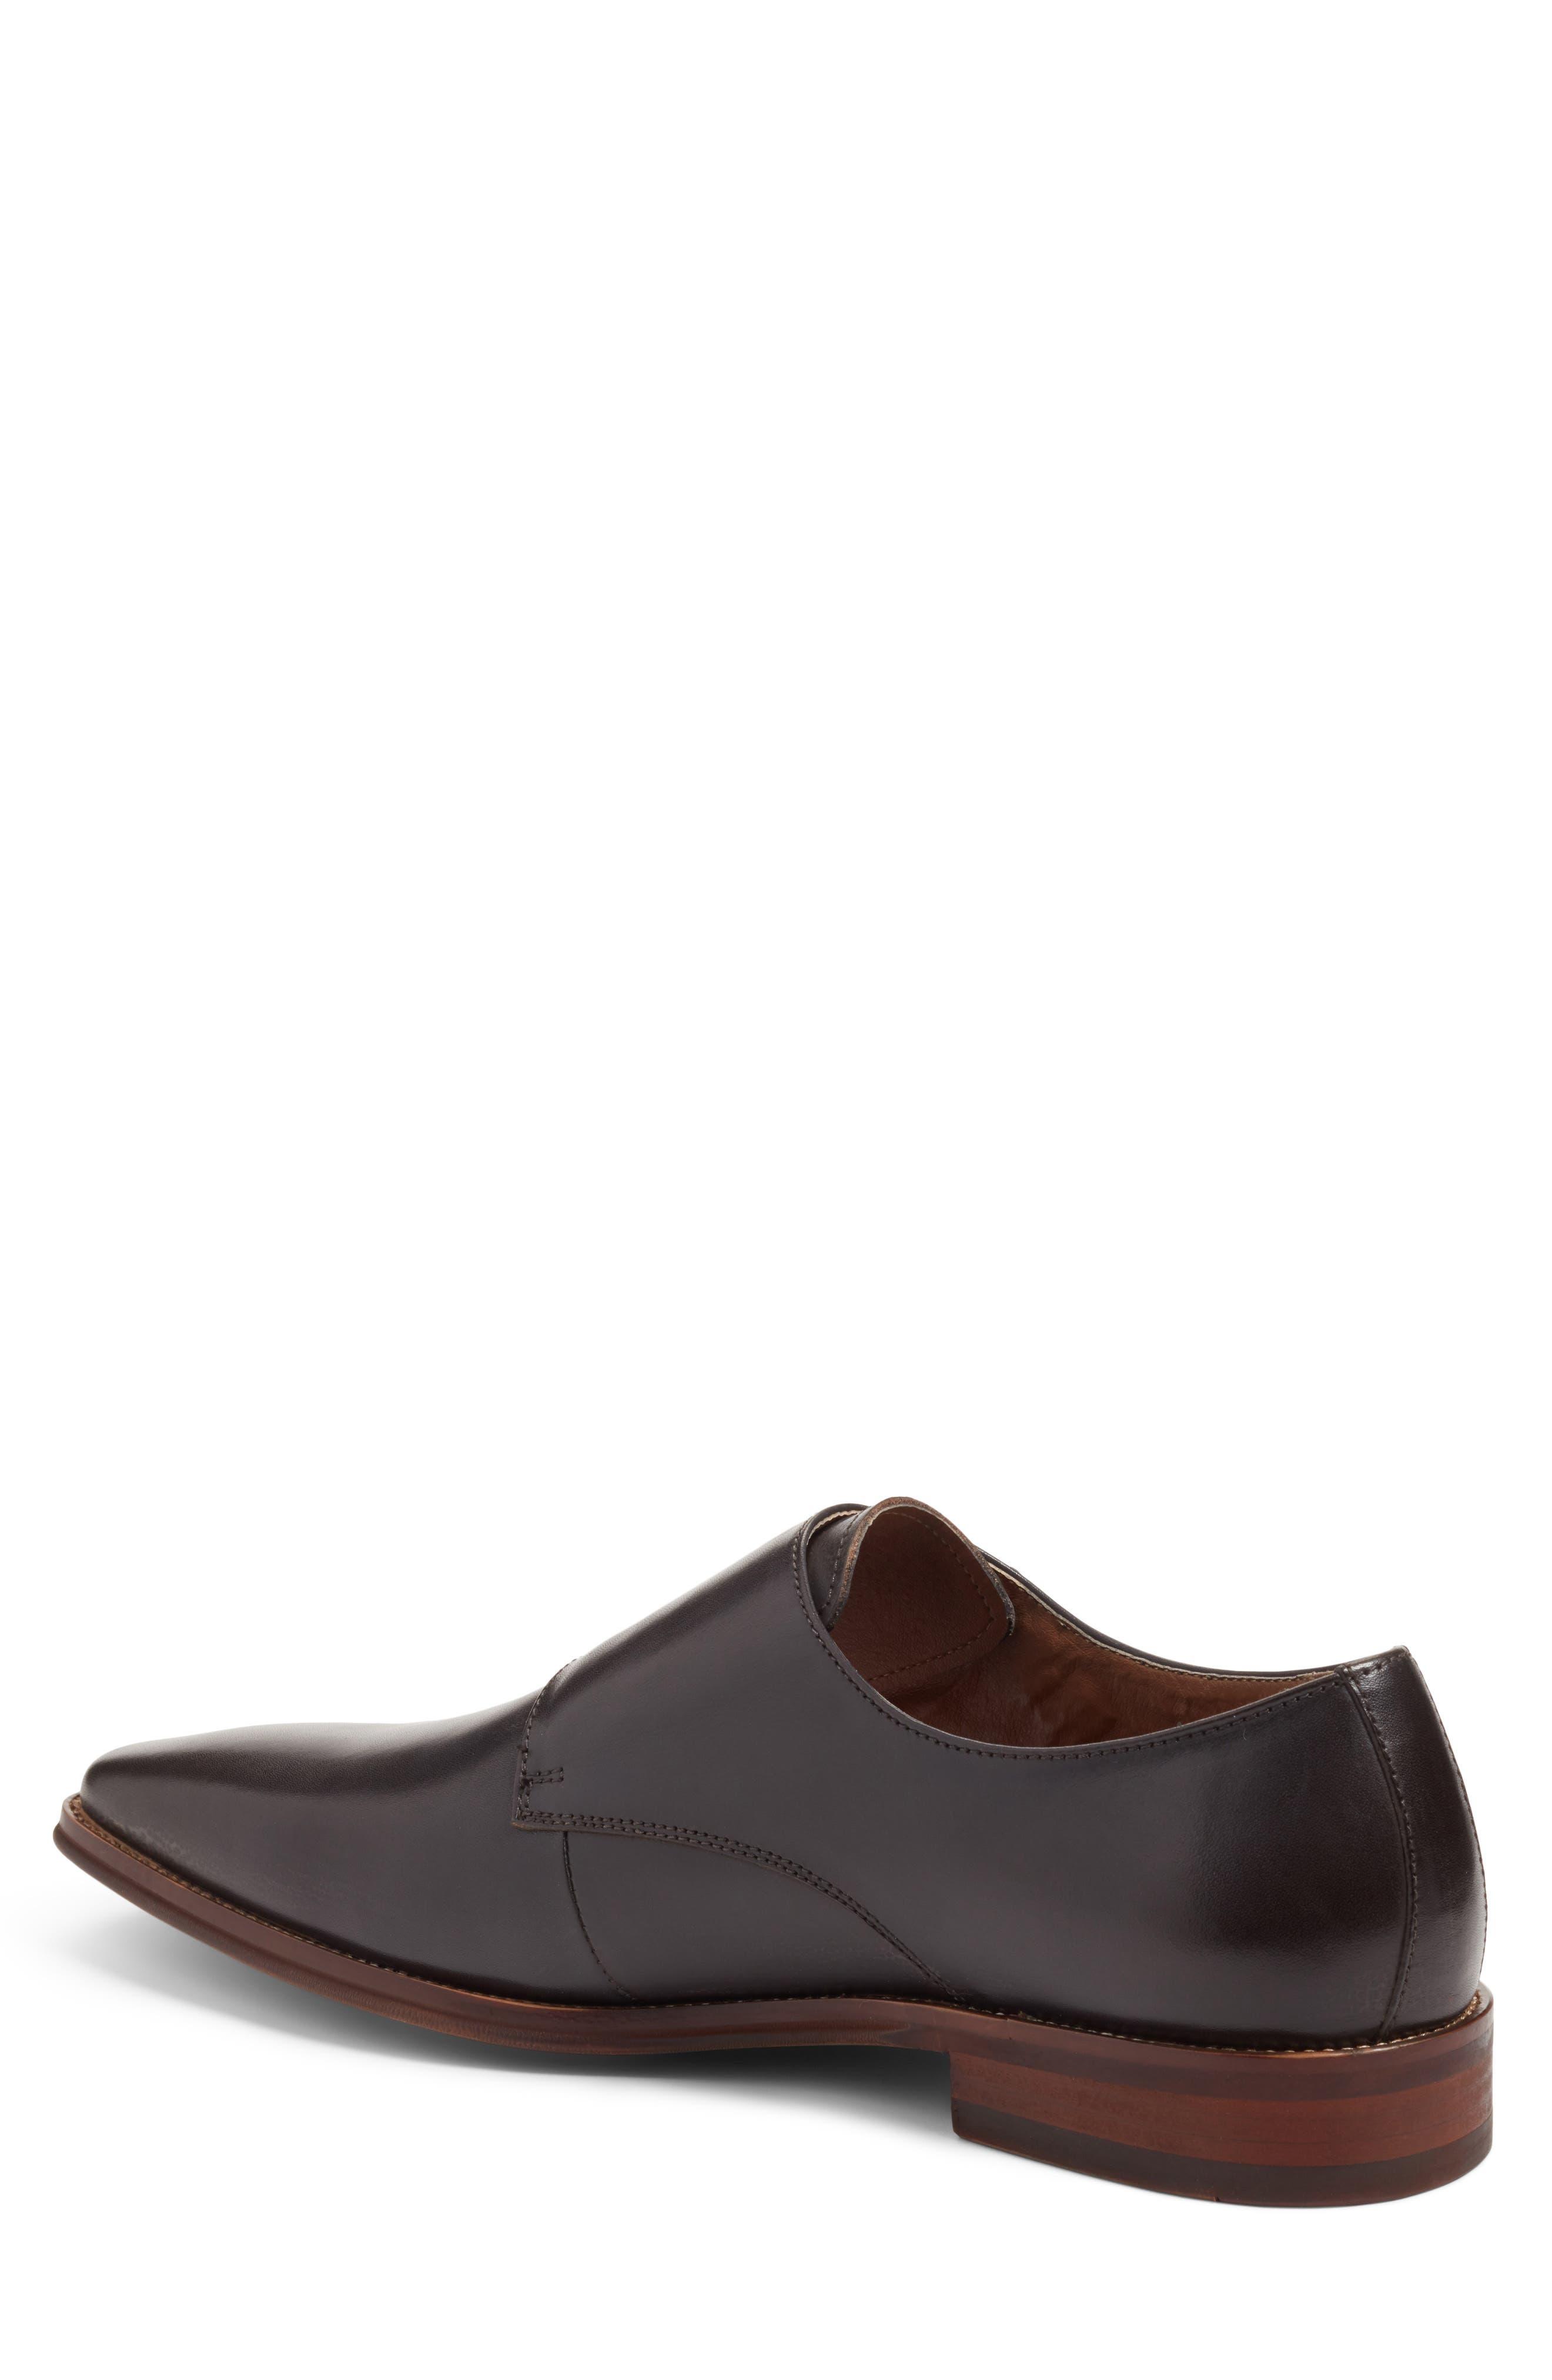 Sedona Double Strap Monk Shoe,                             Alternate thumbnail 2, color,                             Grey Leather